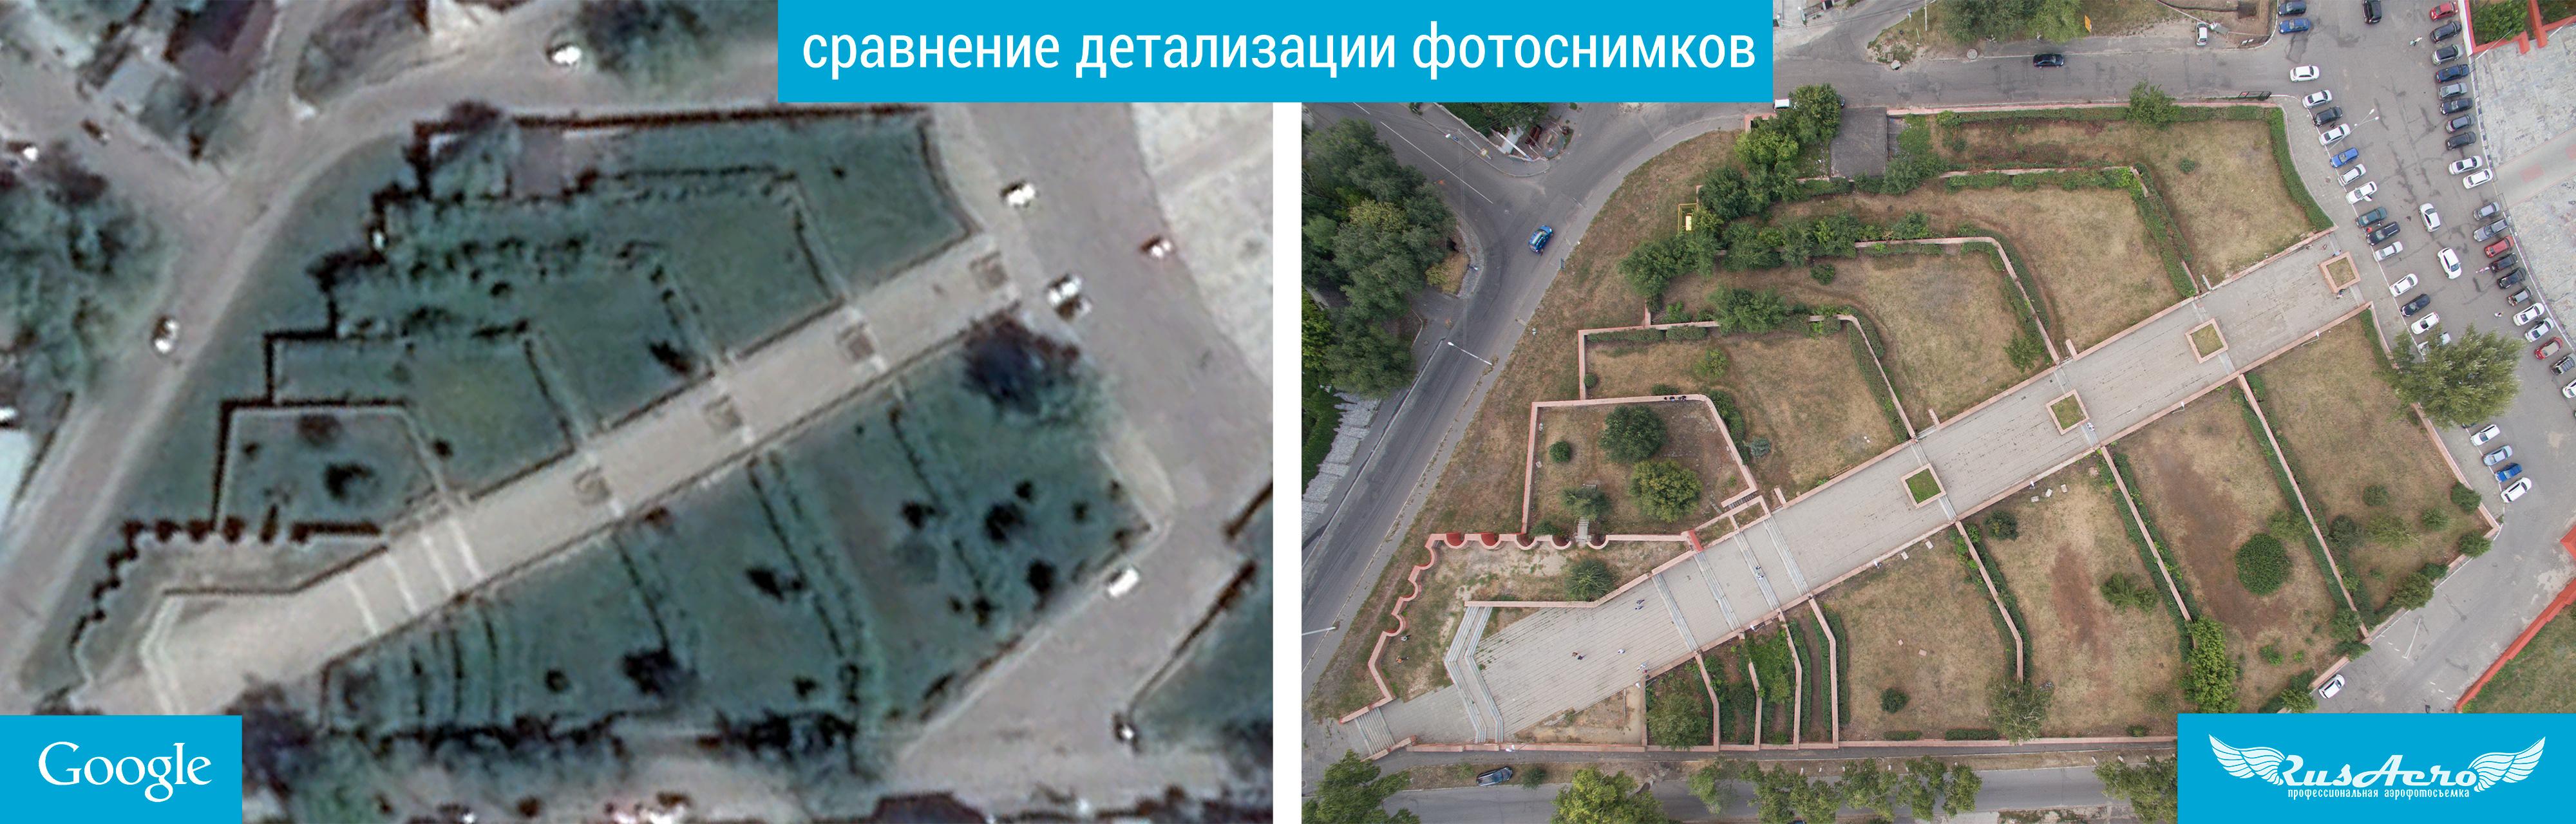 качество детализации аэрофотосъемки Воронеж